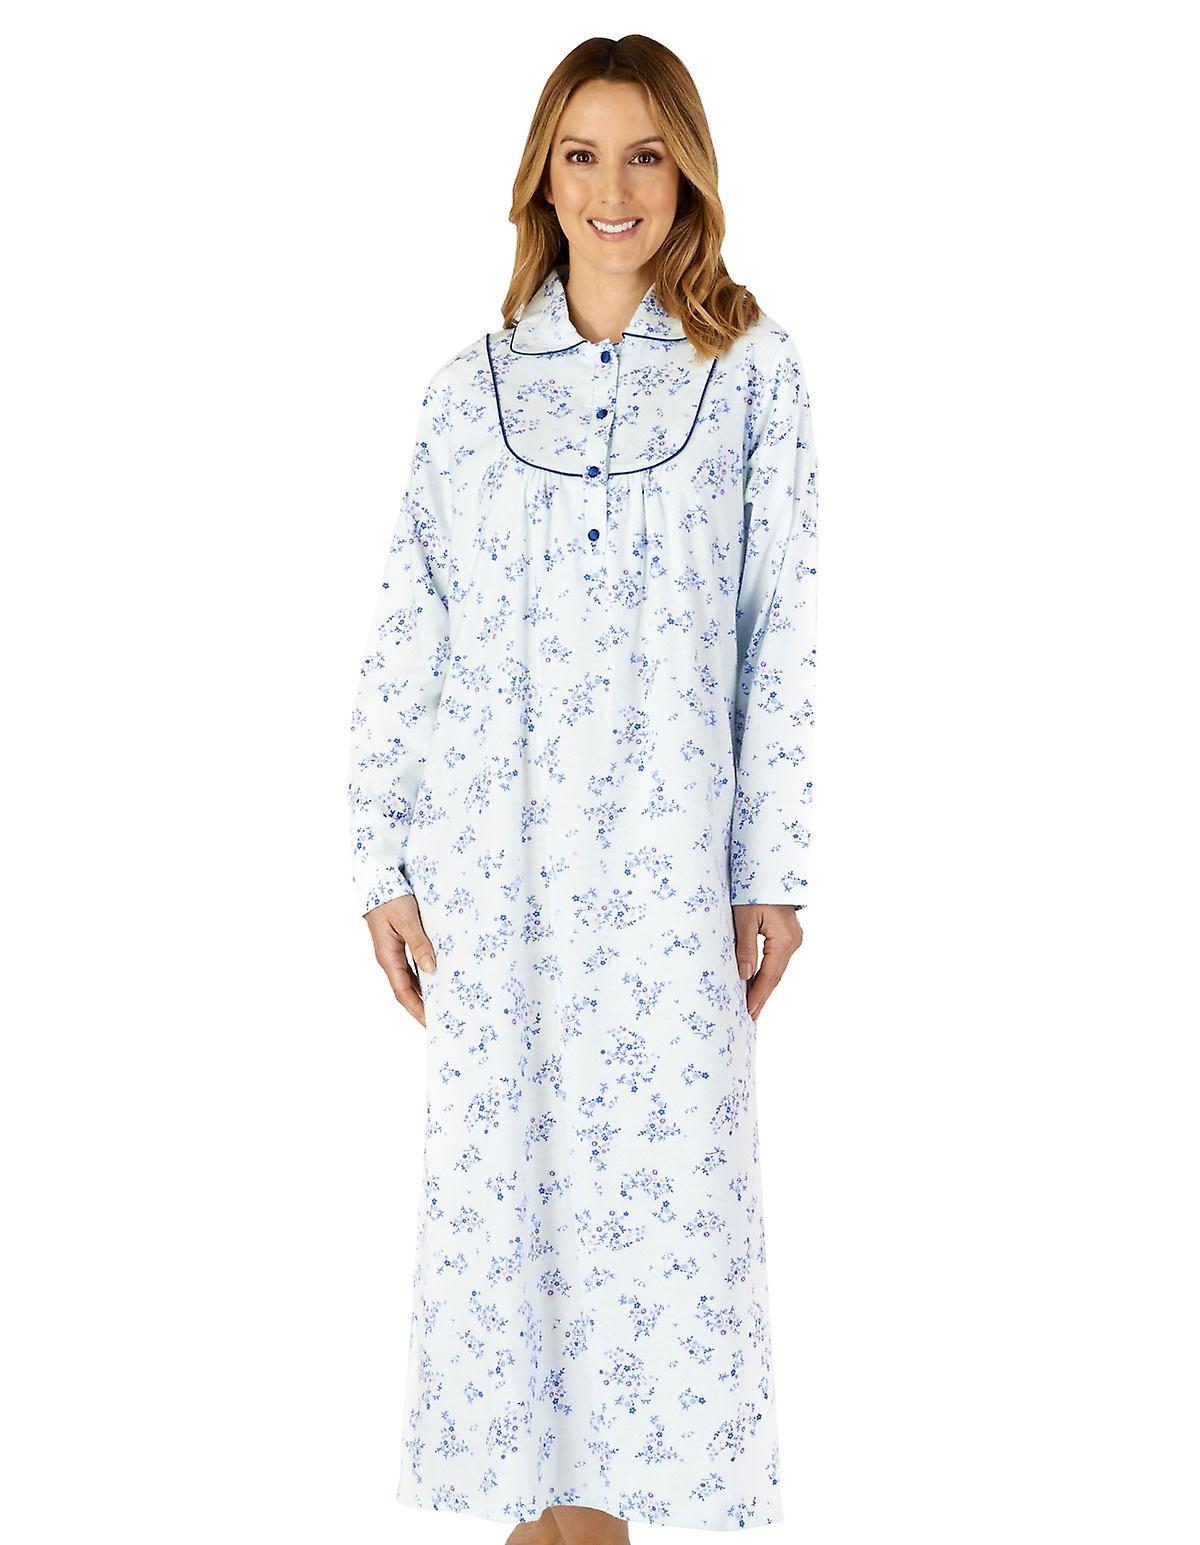 Slenderella ND4212 Women's Woven Floral Cotton Nightdress